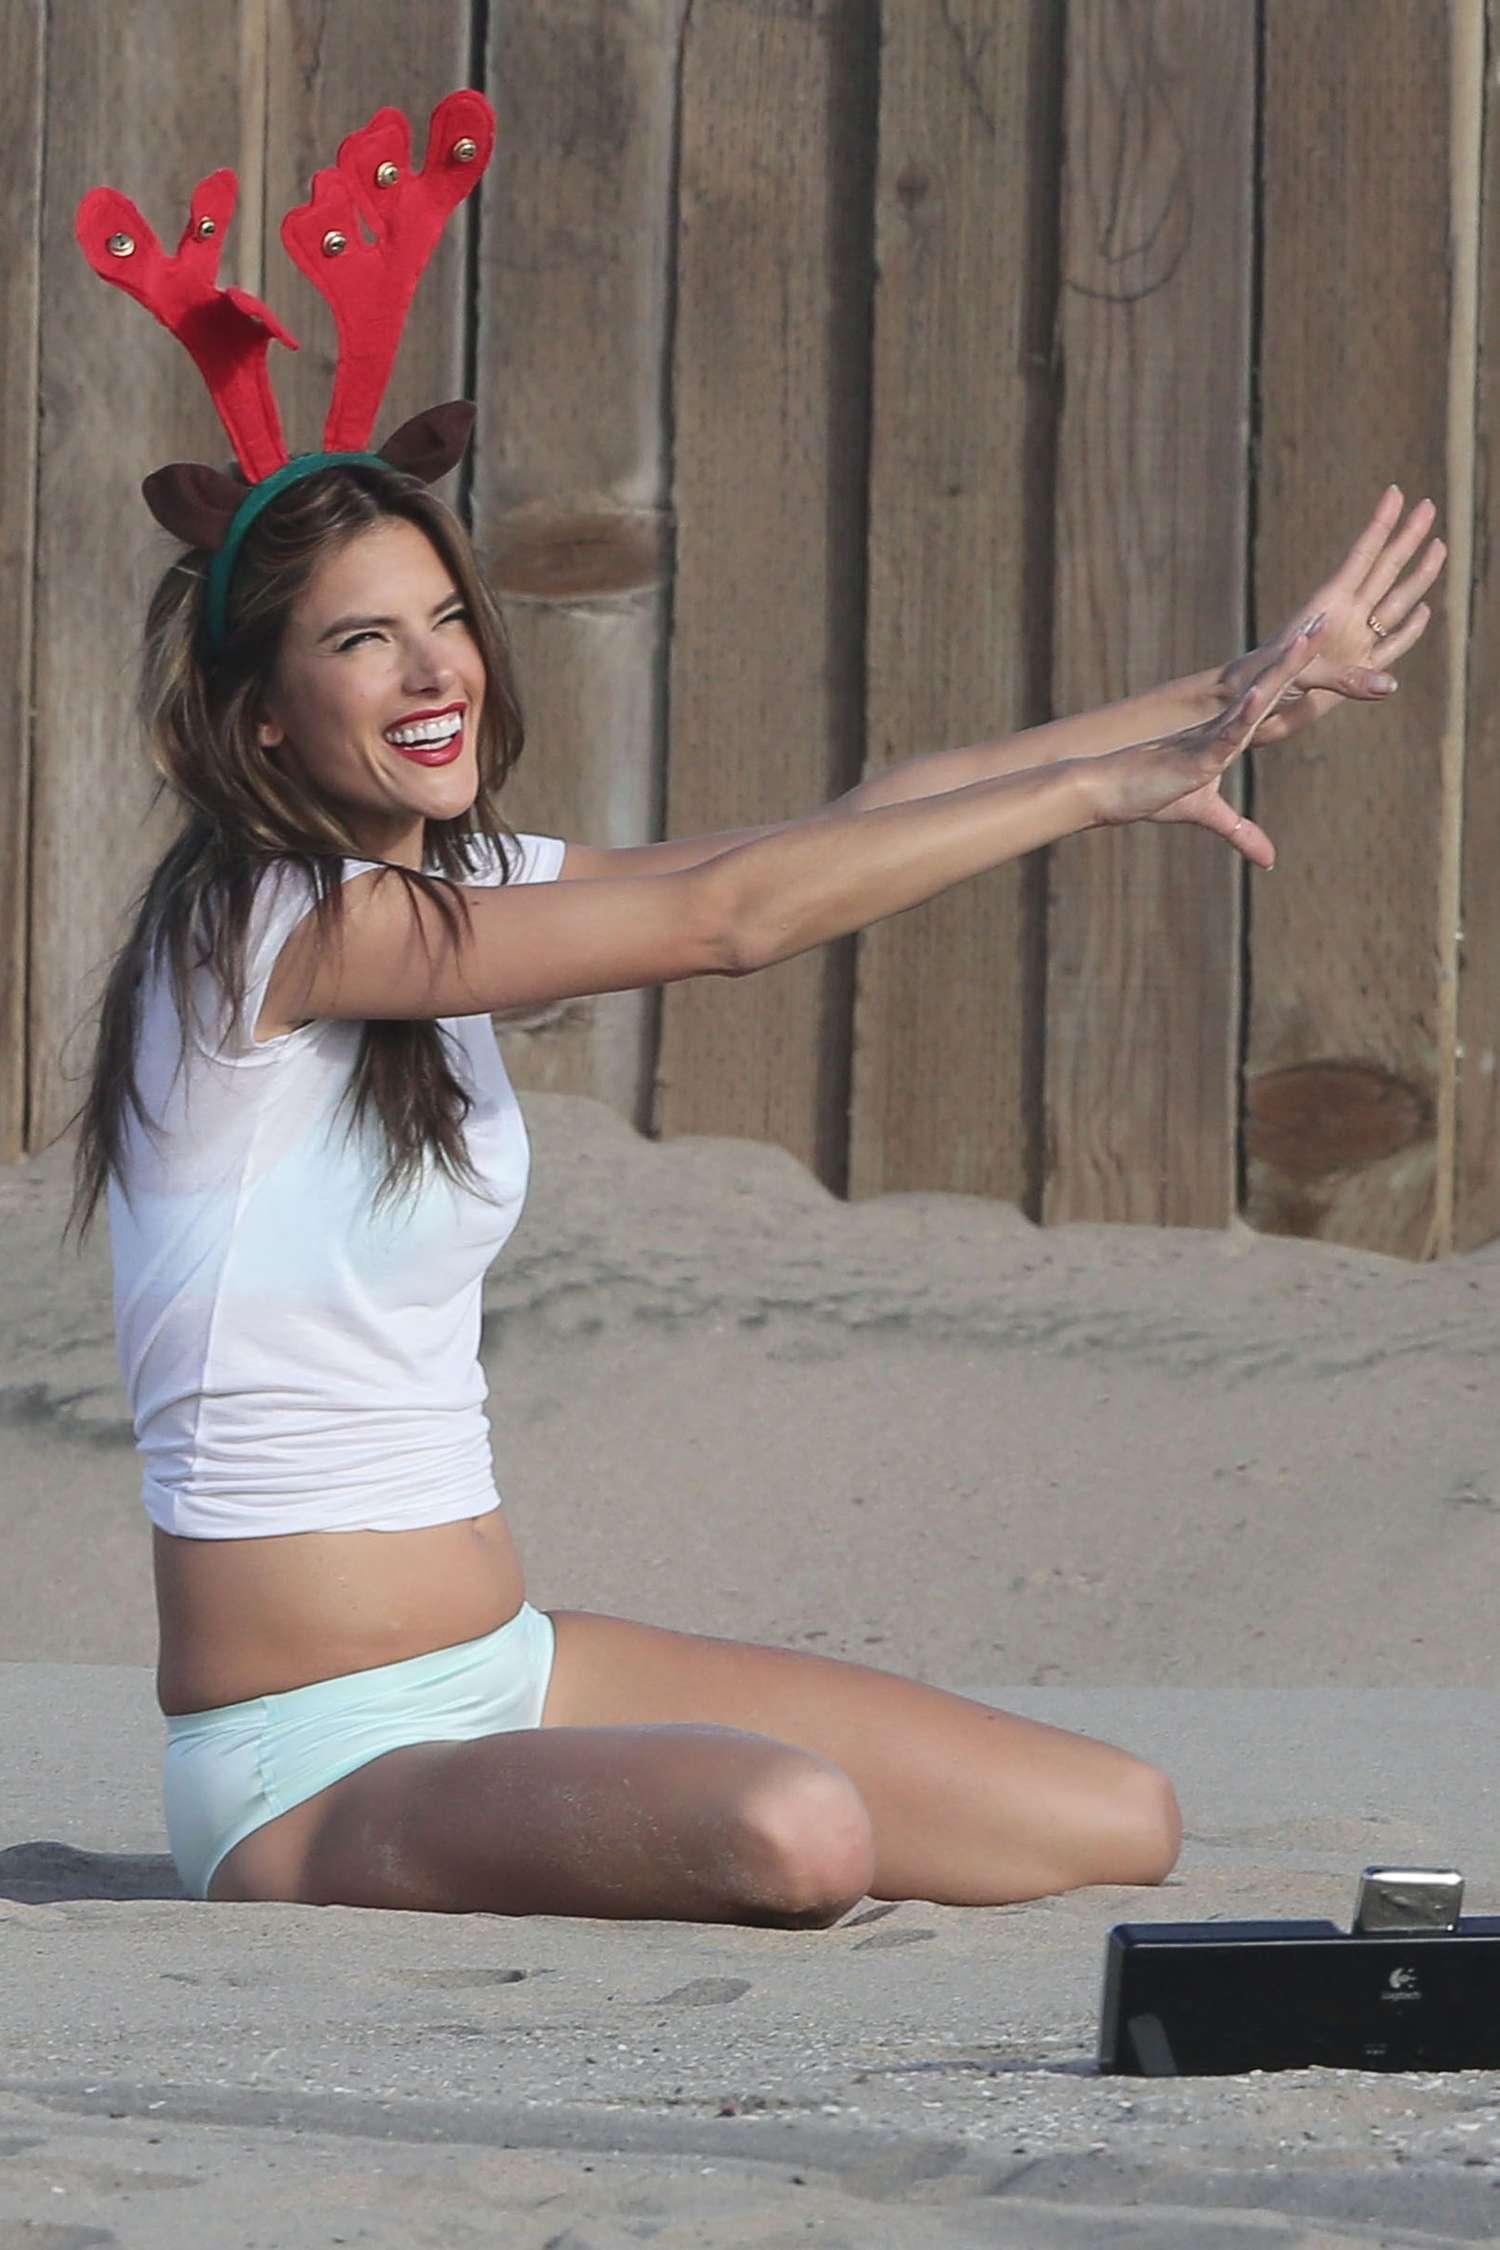 Alessandra Ambrosio Victorias Secret Photoshoot in LA